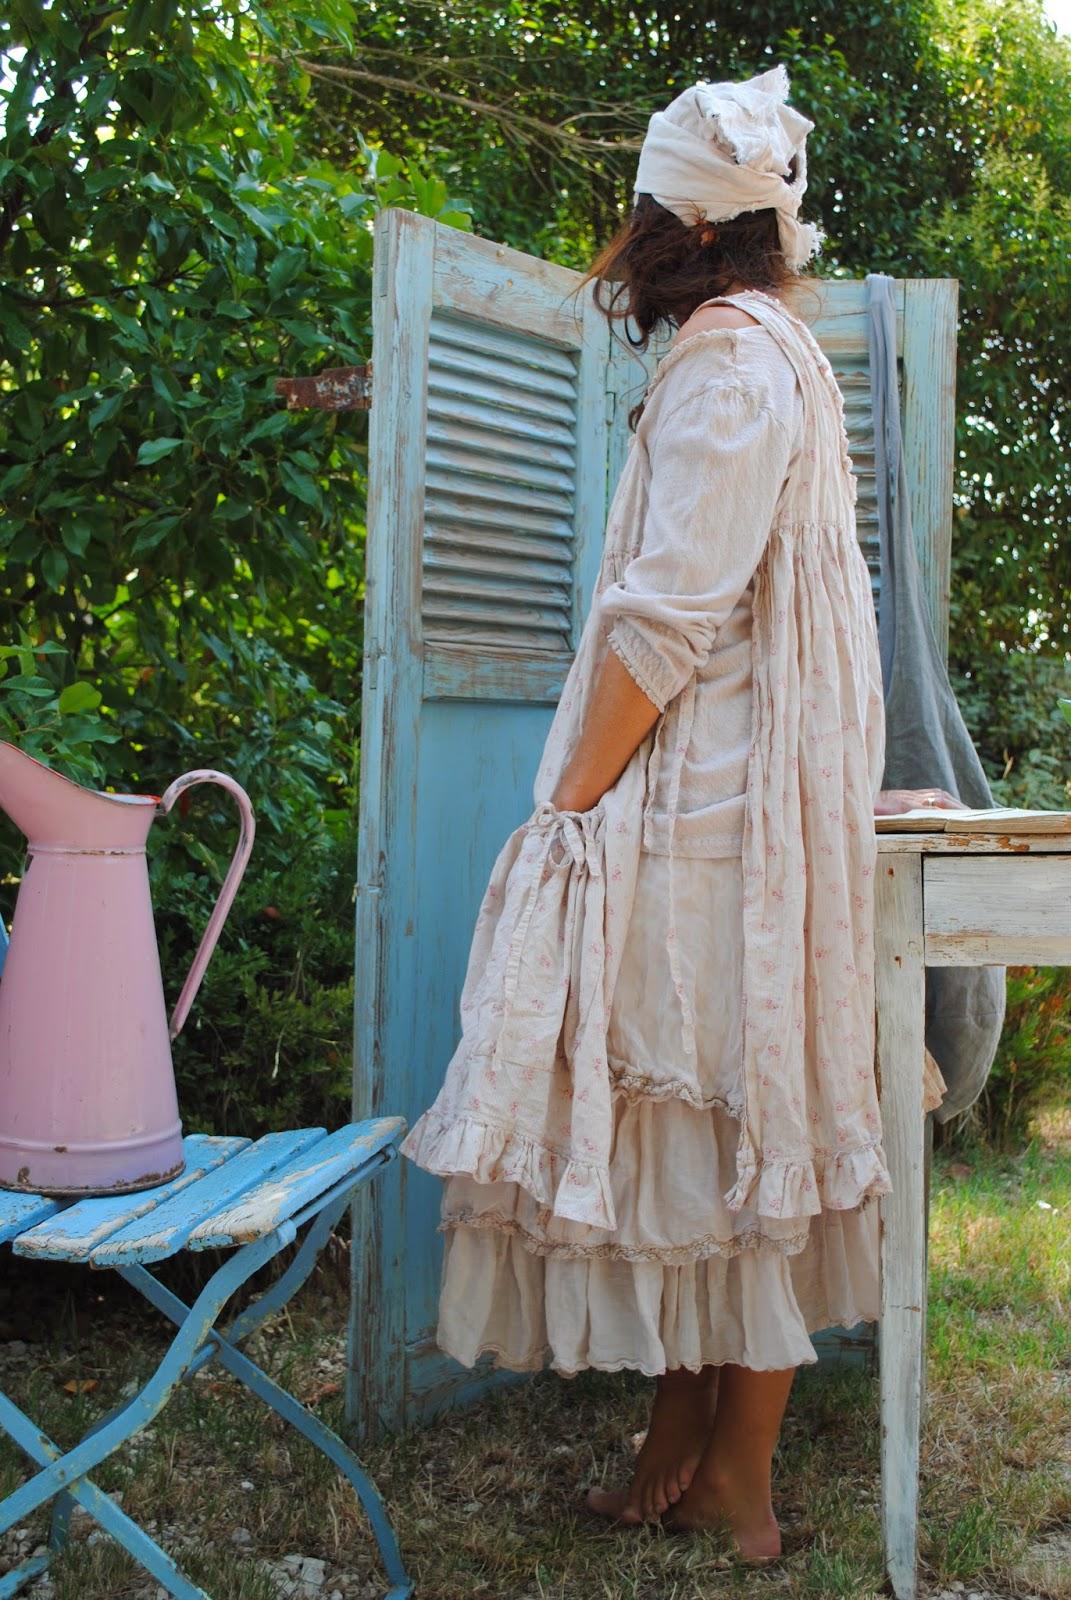 http://giveto.canalblog.com/